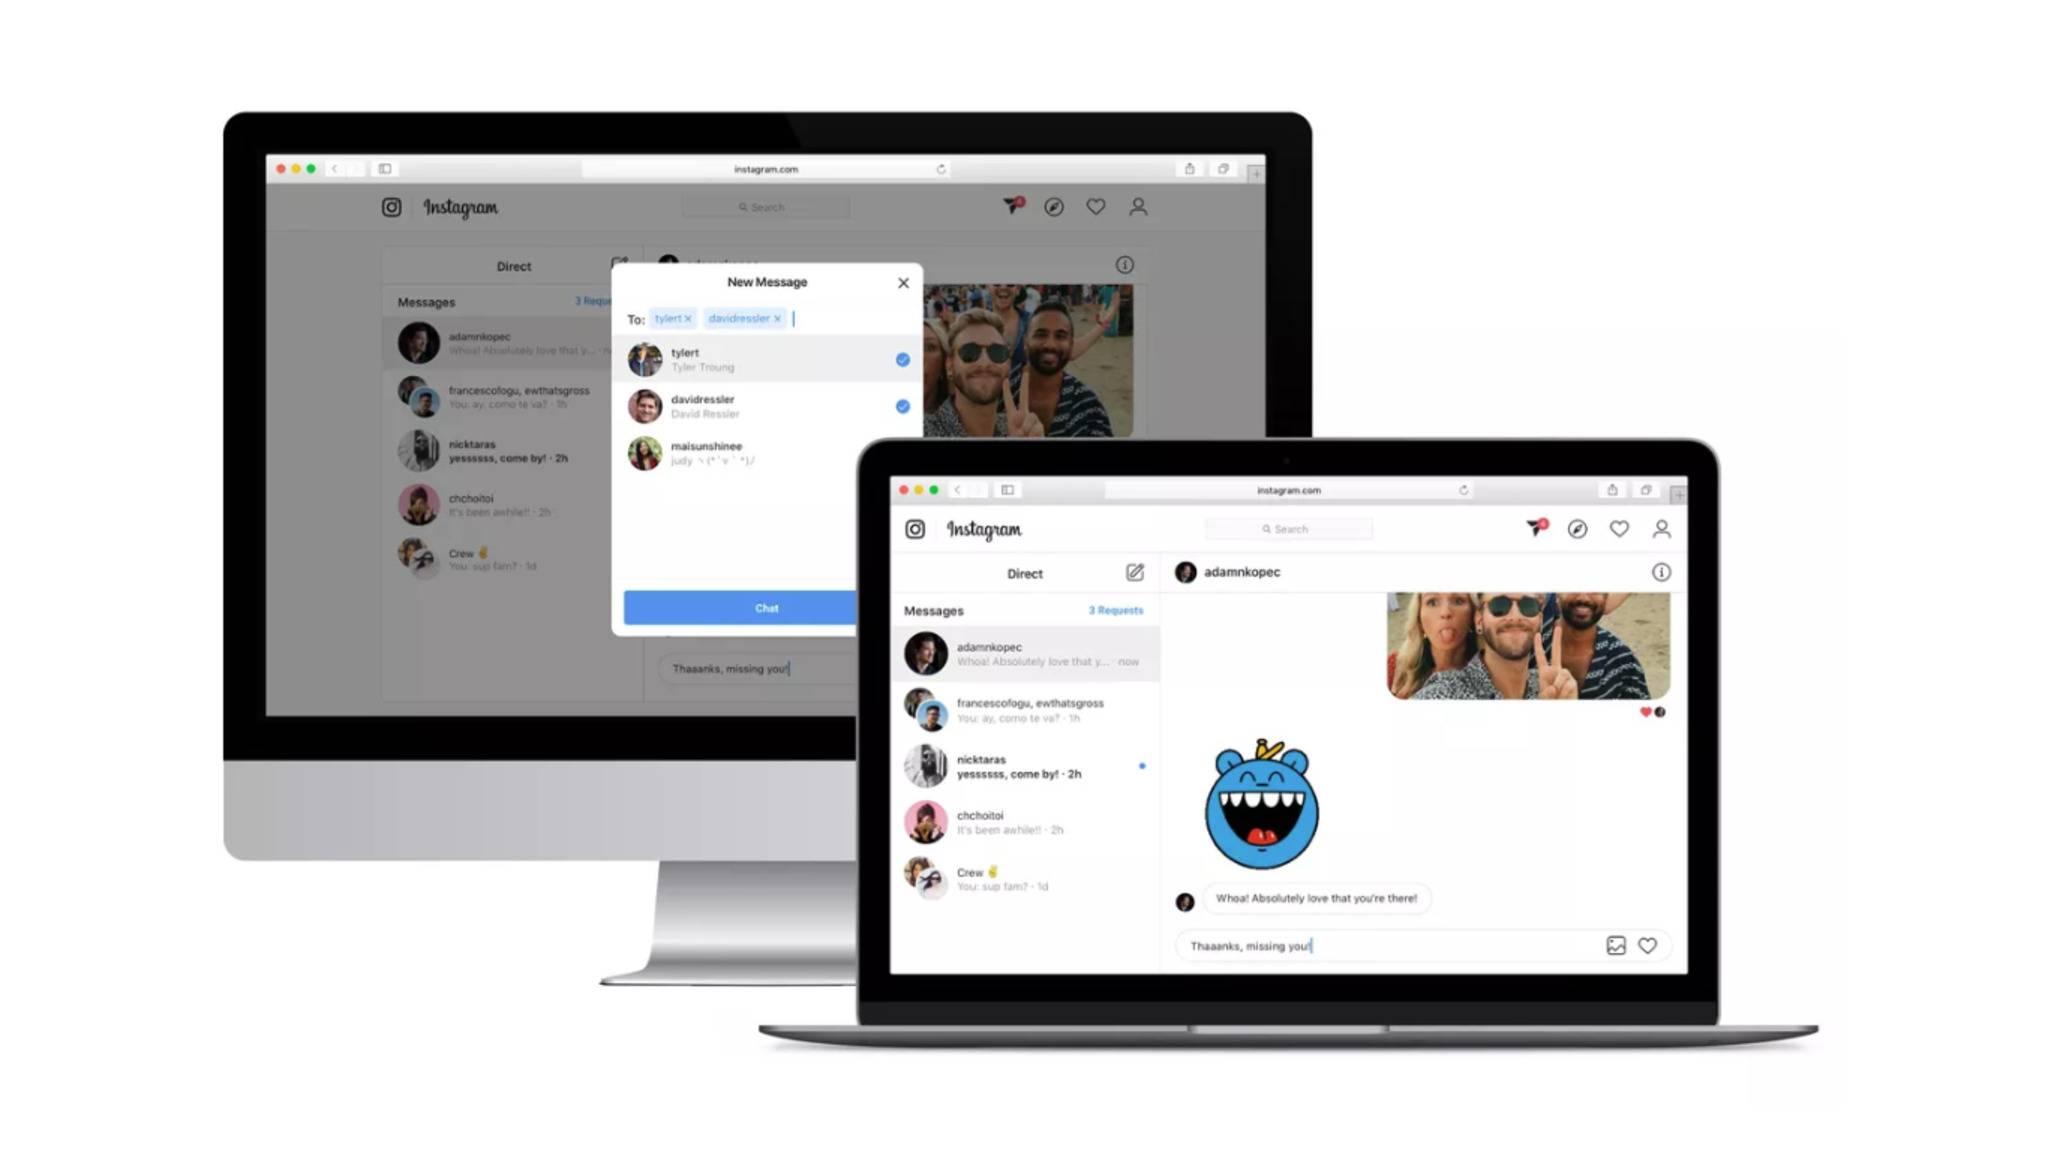 instagram-desktop-pc-browser